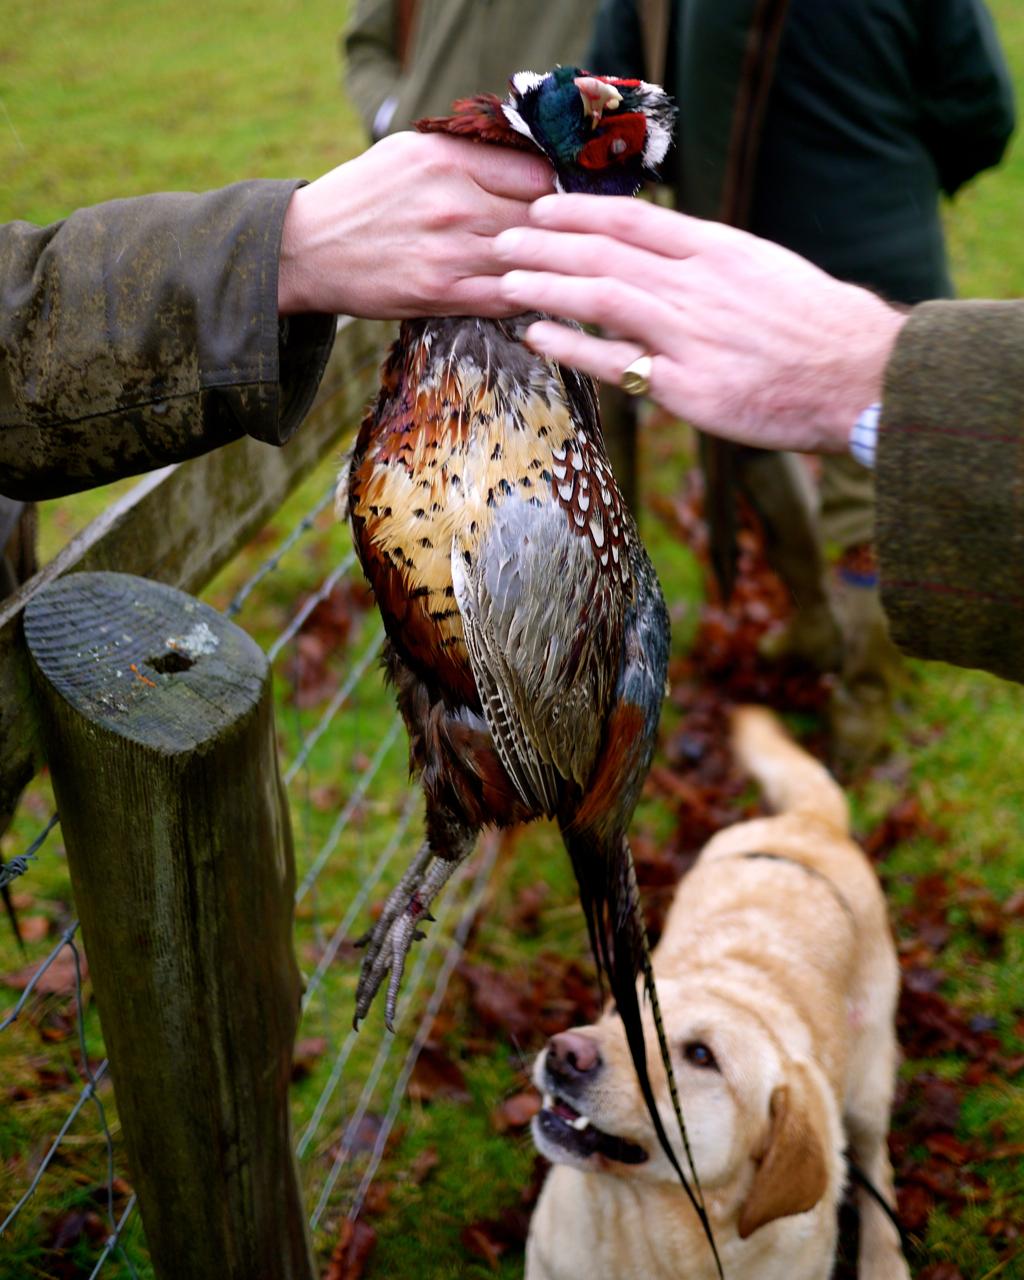 Pheasant Shoot Godsavethescene